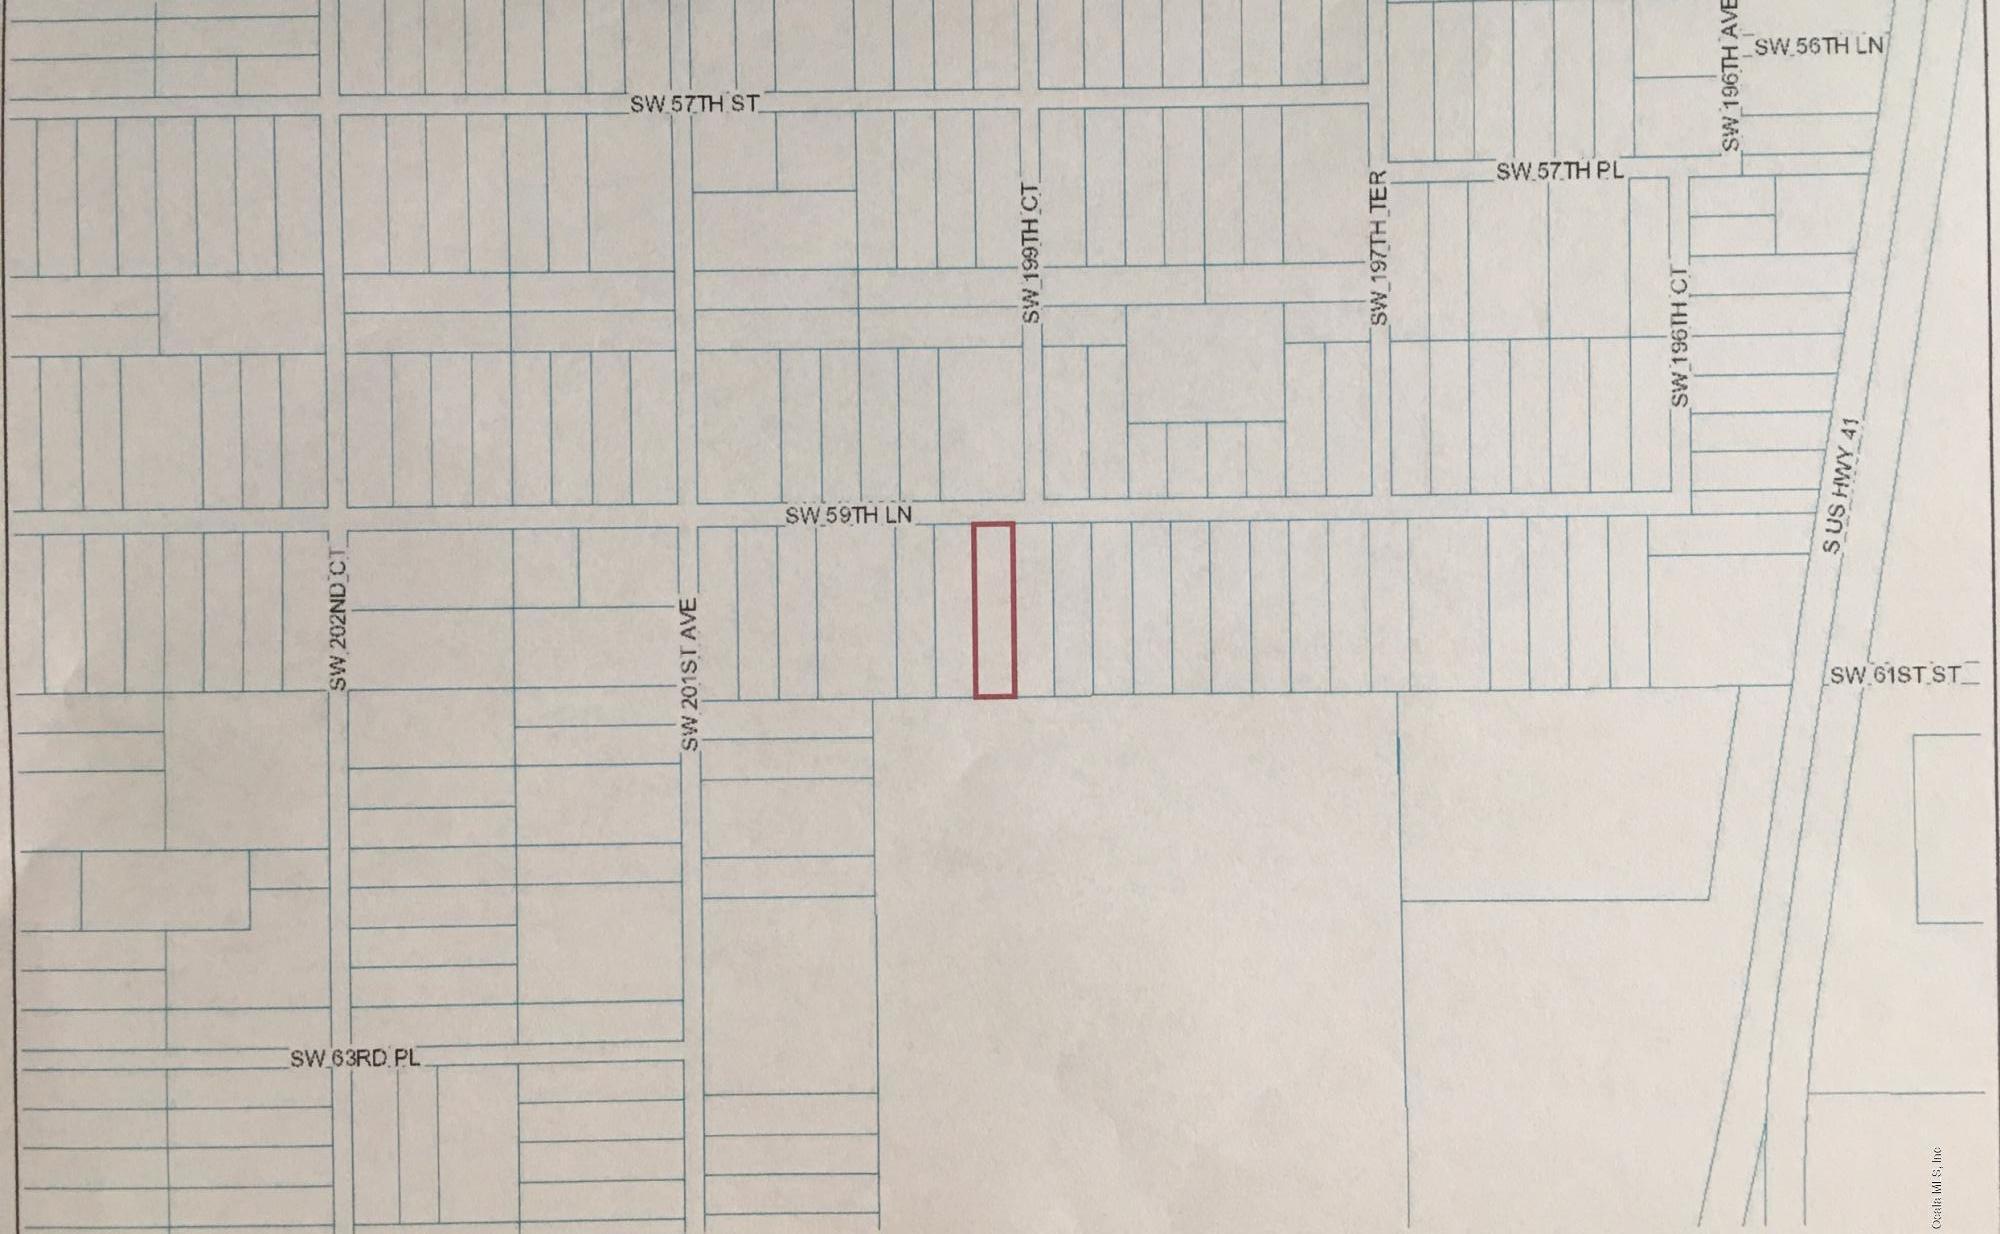 000 SW 59th Lane, Dunnellon, FL 34431